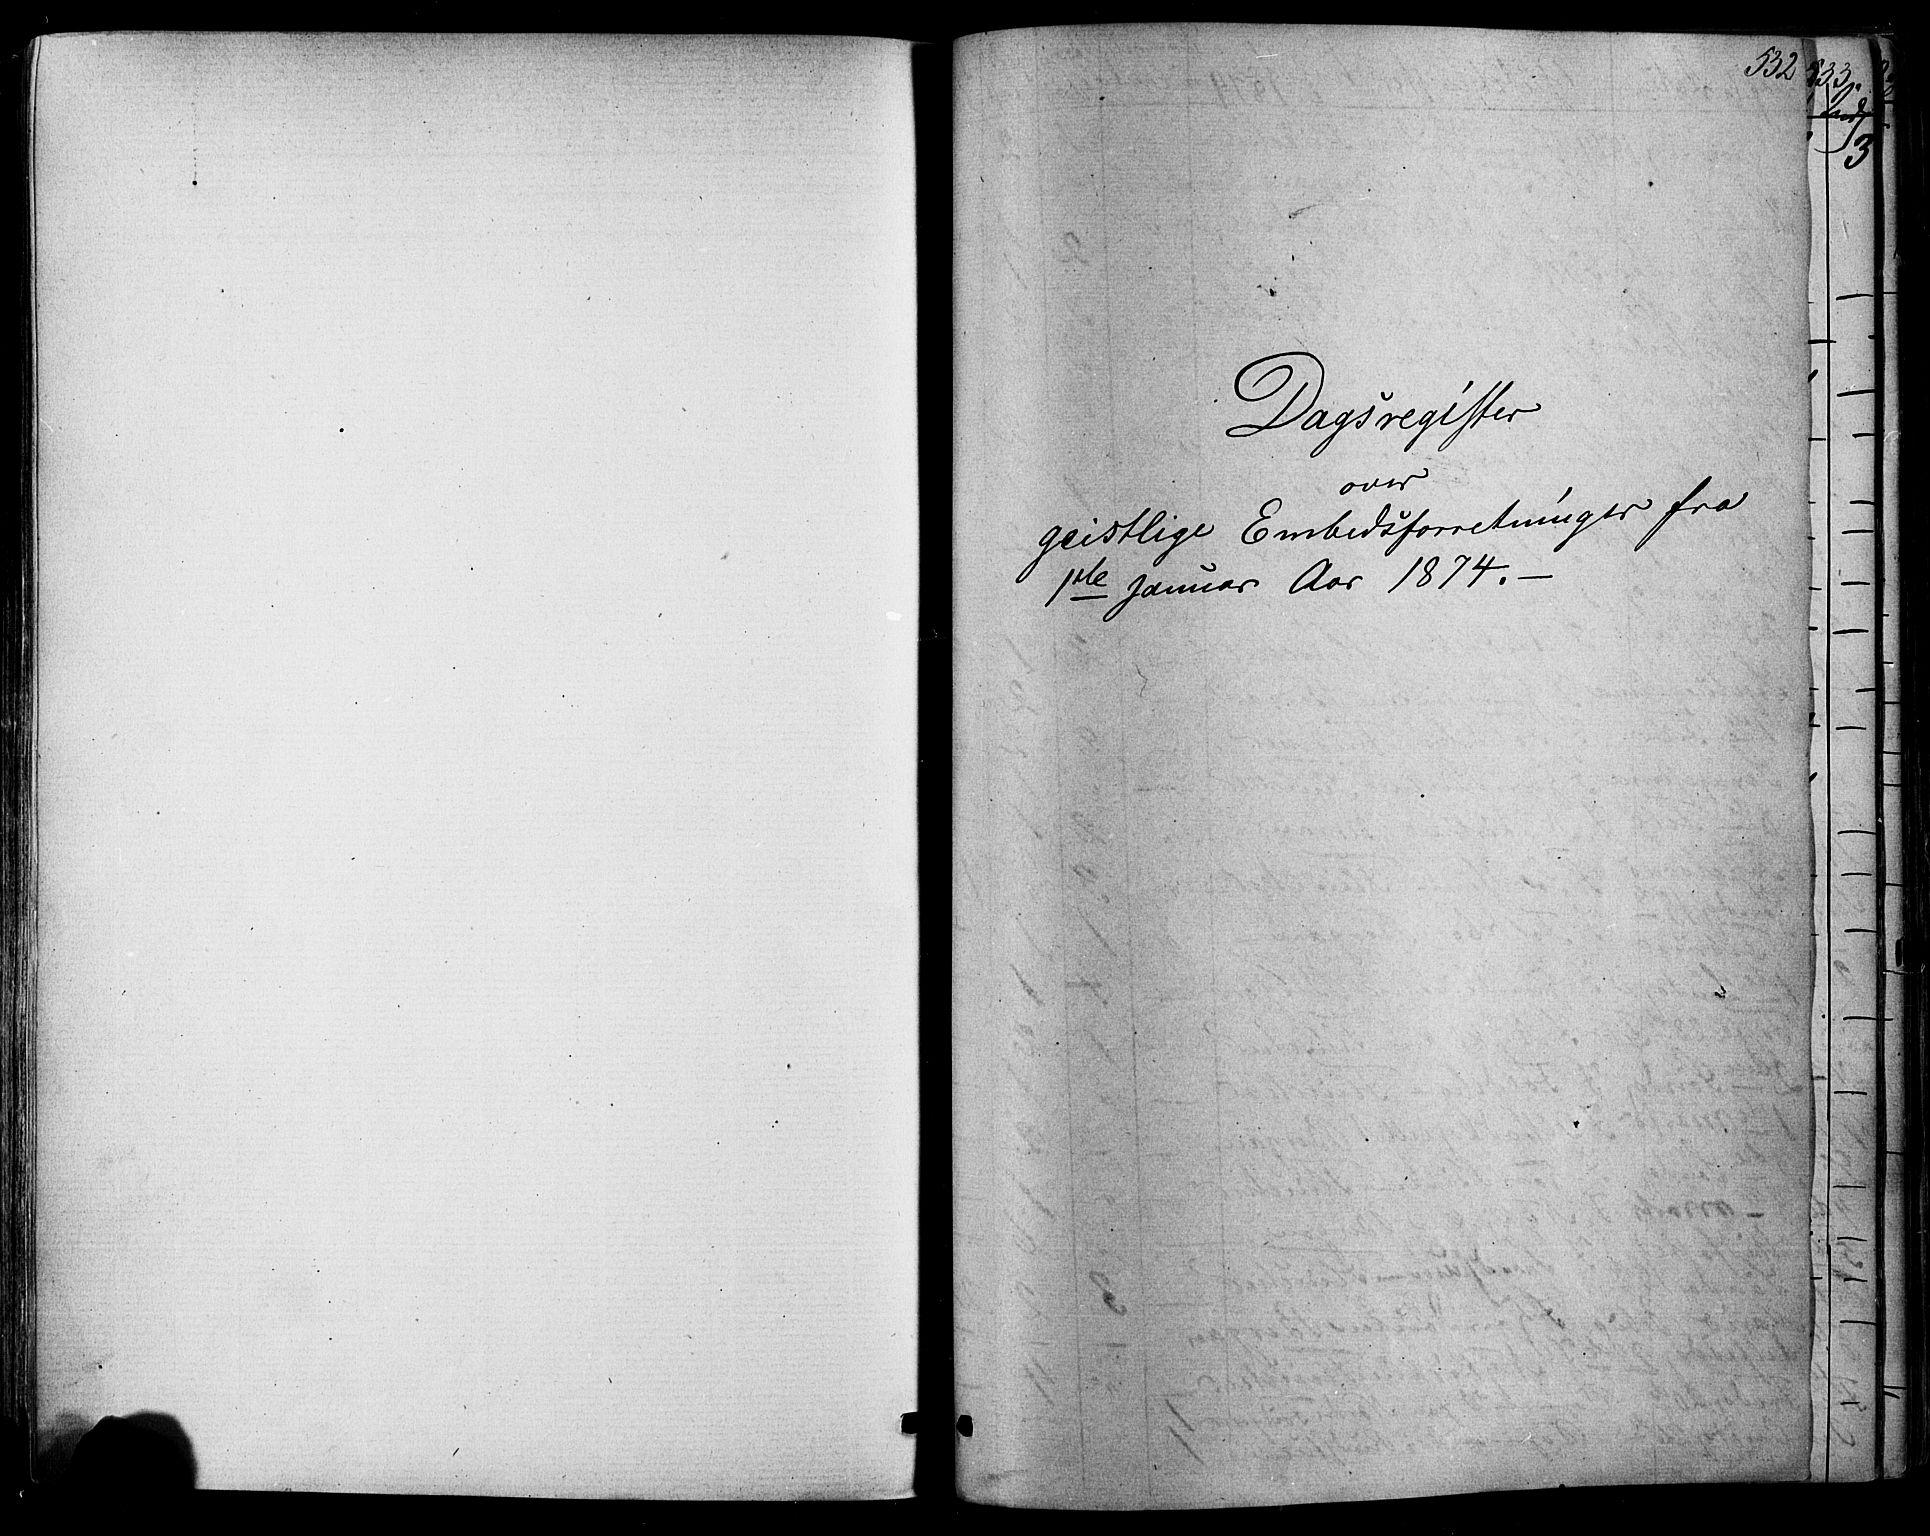 SAH, Østre Gausdal prestekontor, Ministerialbok nr. 1, 1874-1886, s. 532